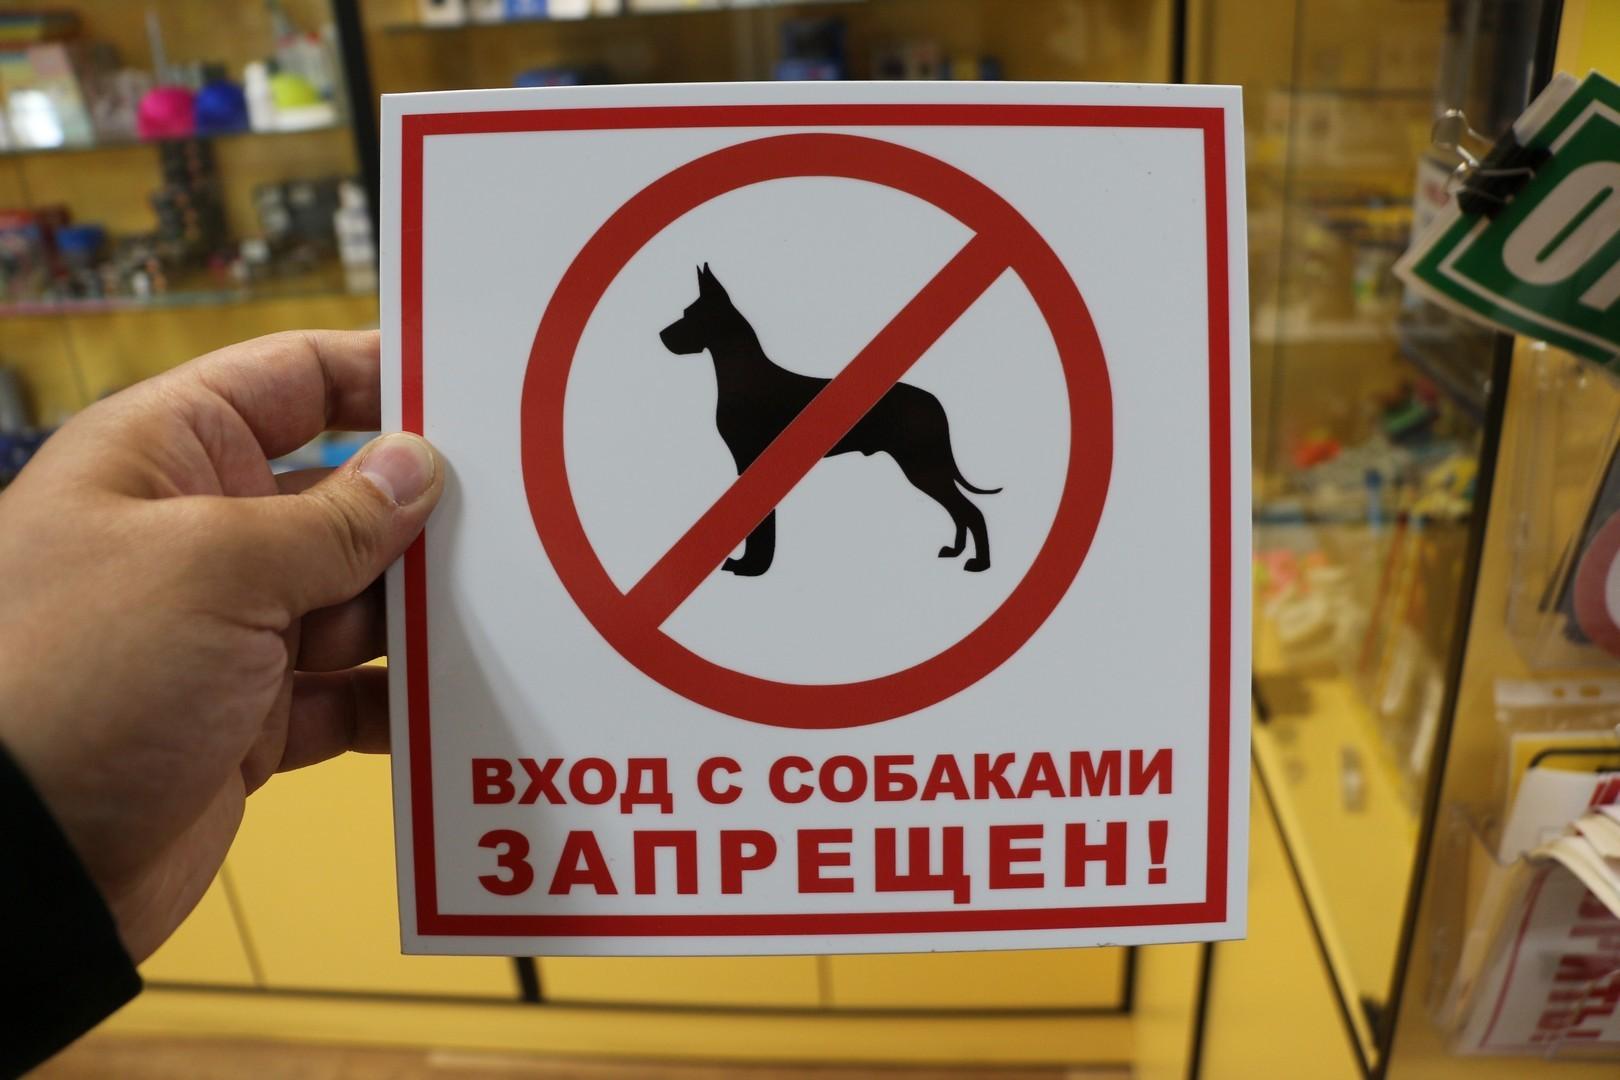 стикеры на заказ москва